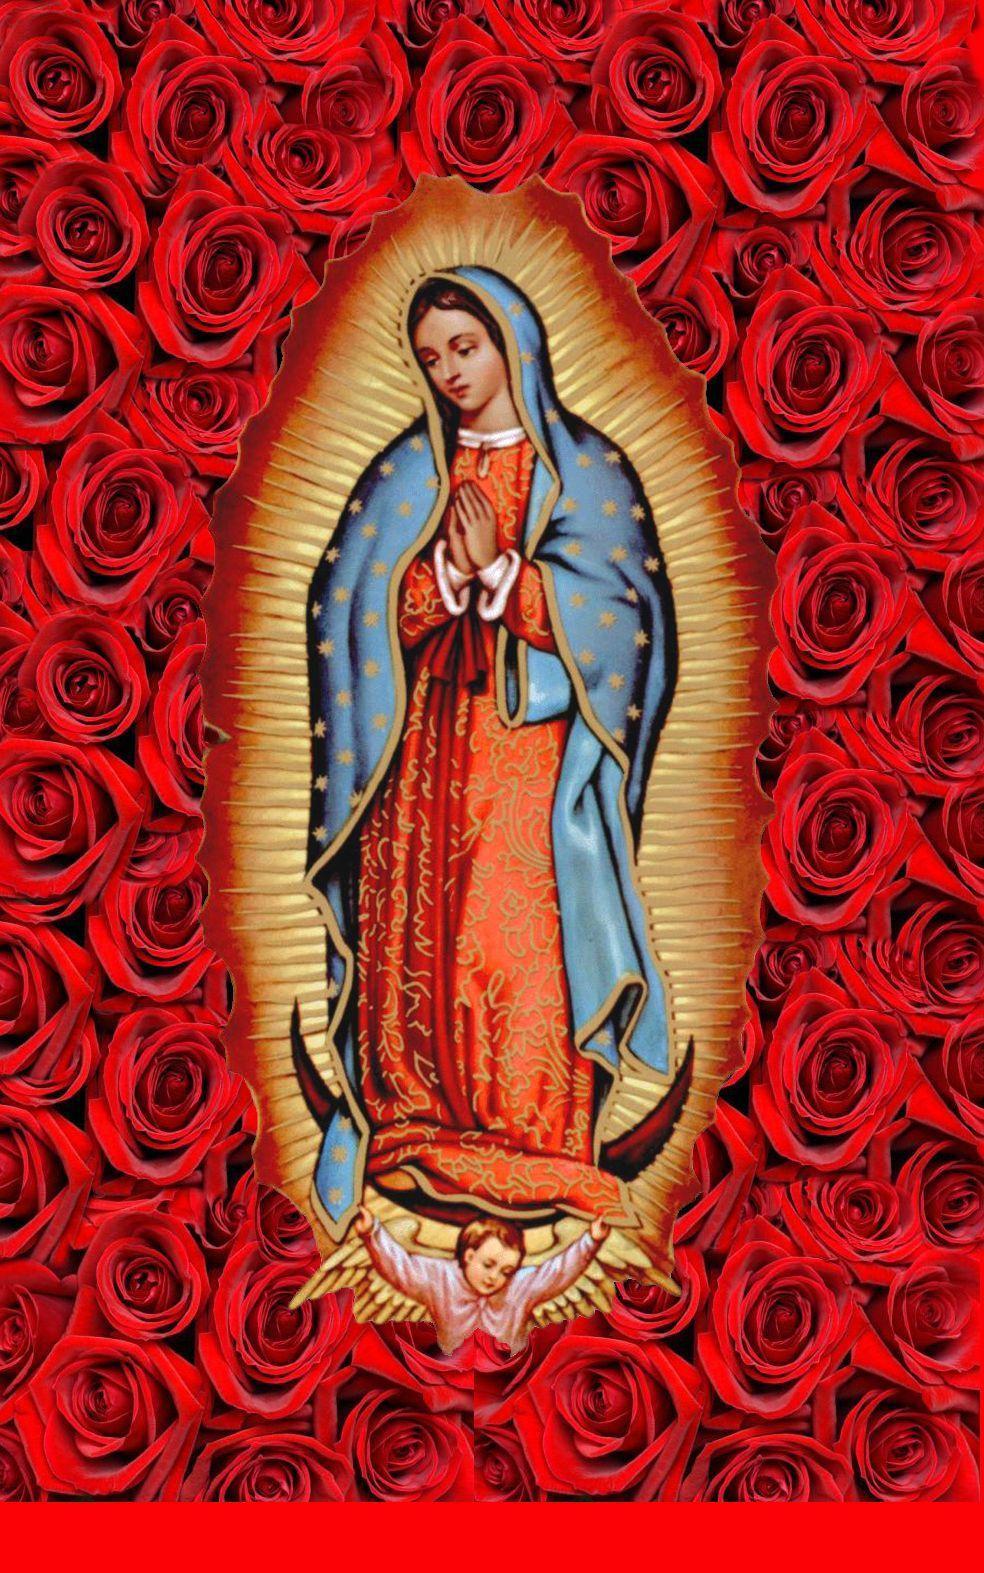 Virgen de guadalupe wallpapers wallpaper cave - Images of la virgen de guadalupe ...